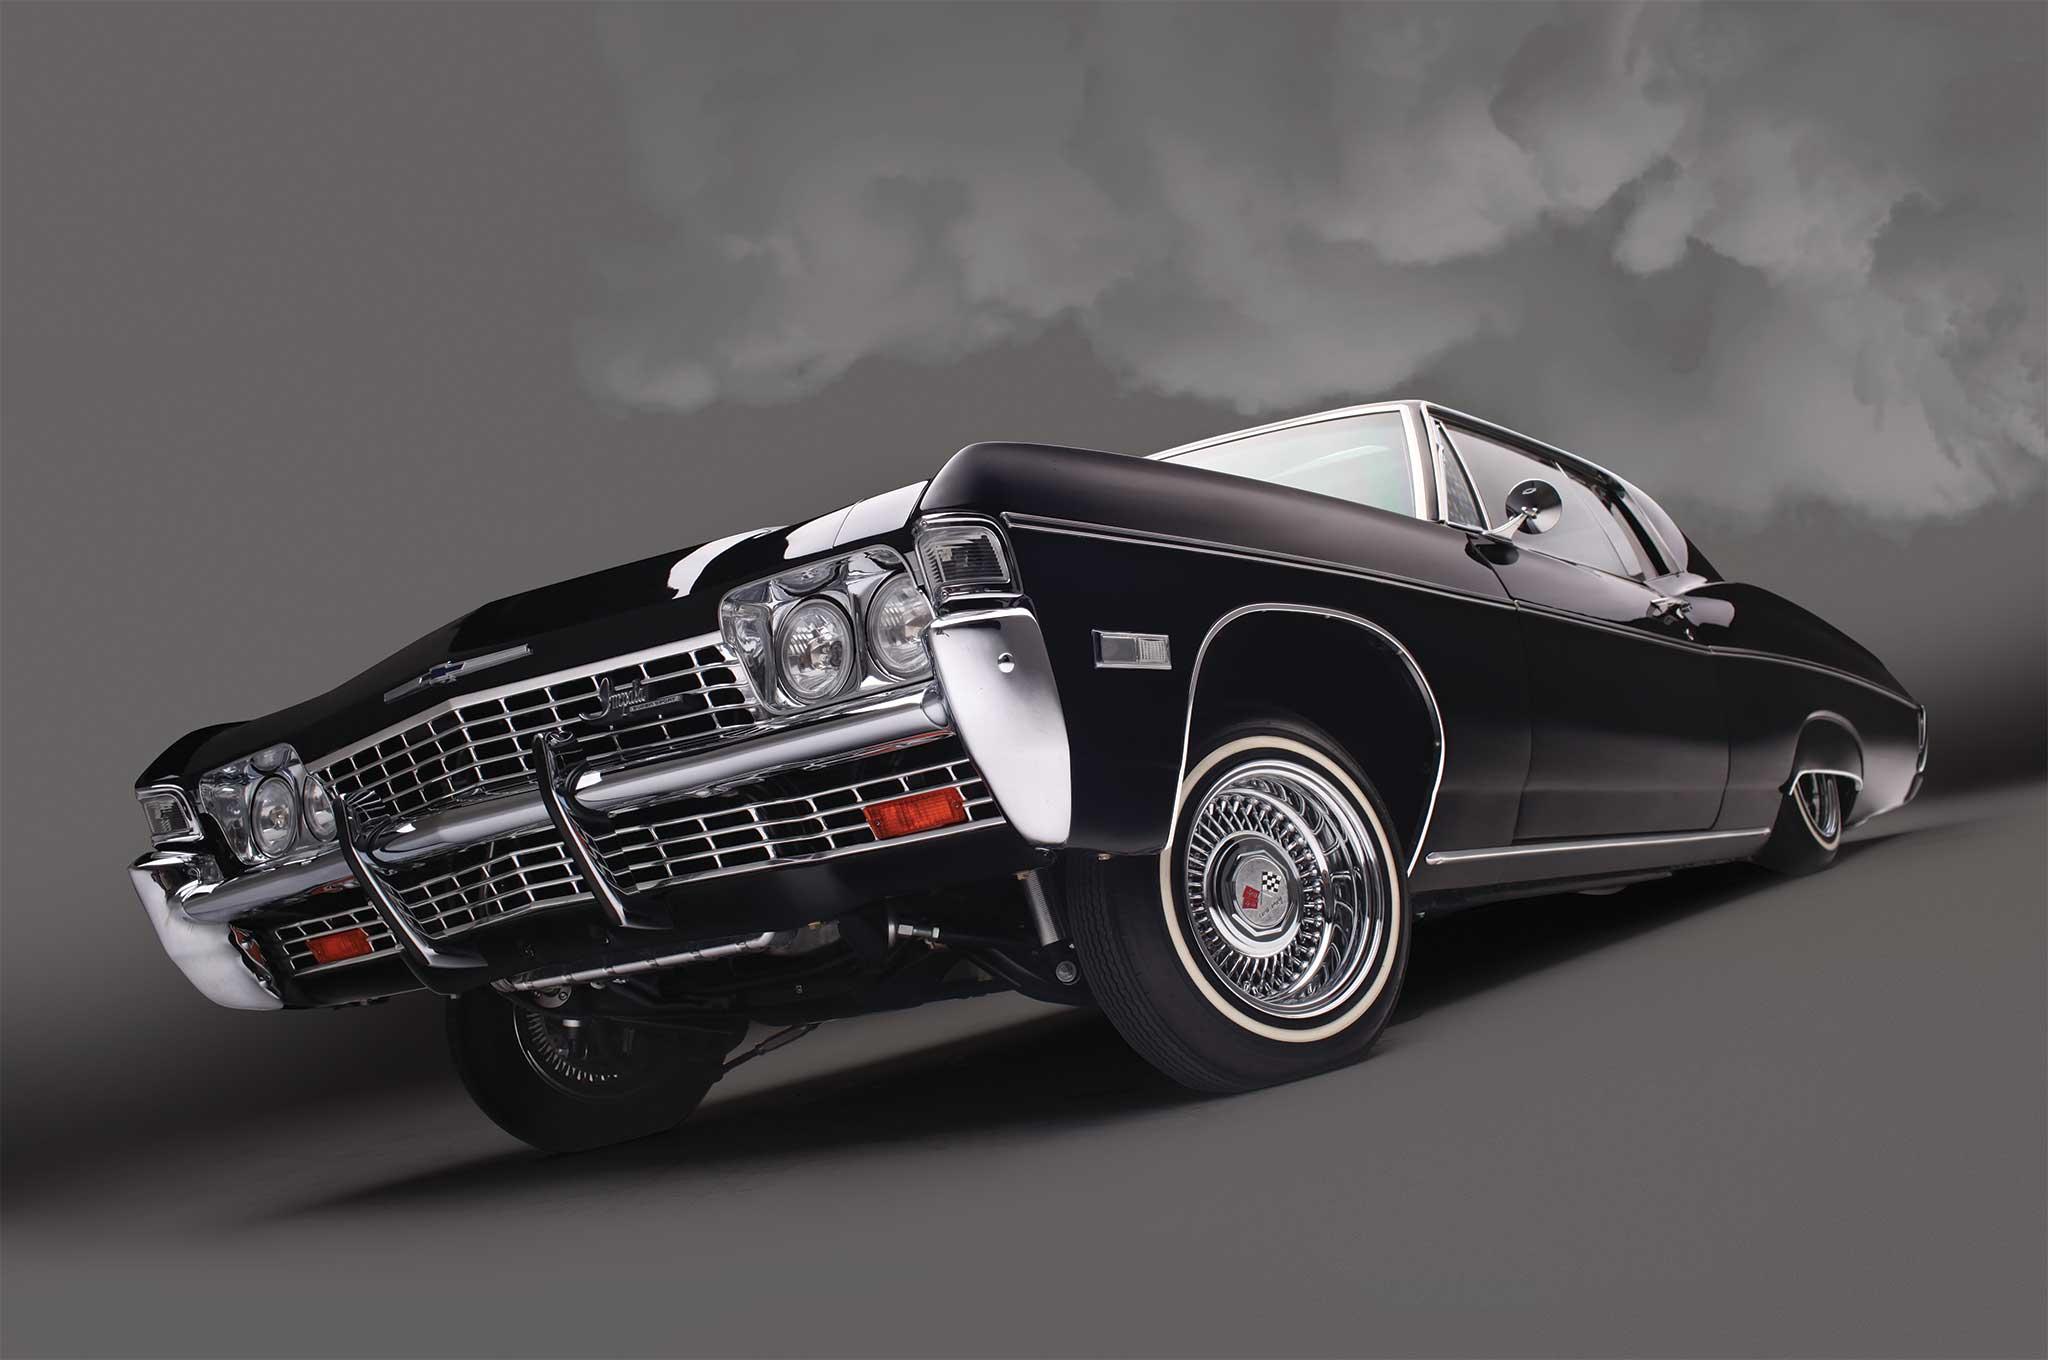 1968 Chevrolet Impala SS - Black on Black Comeback - Lowrider